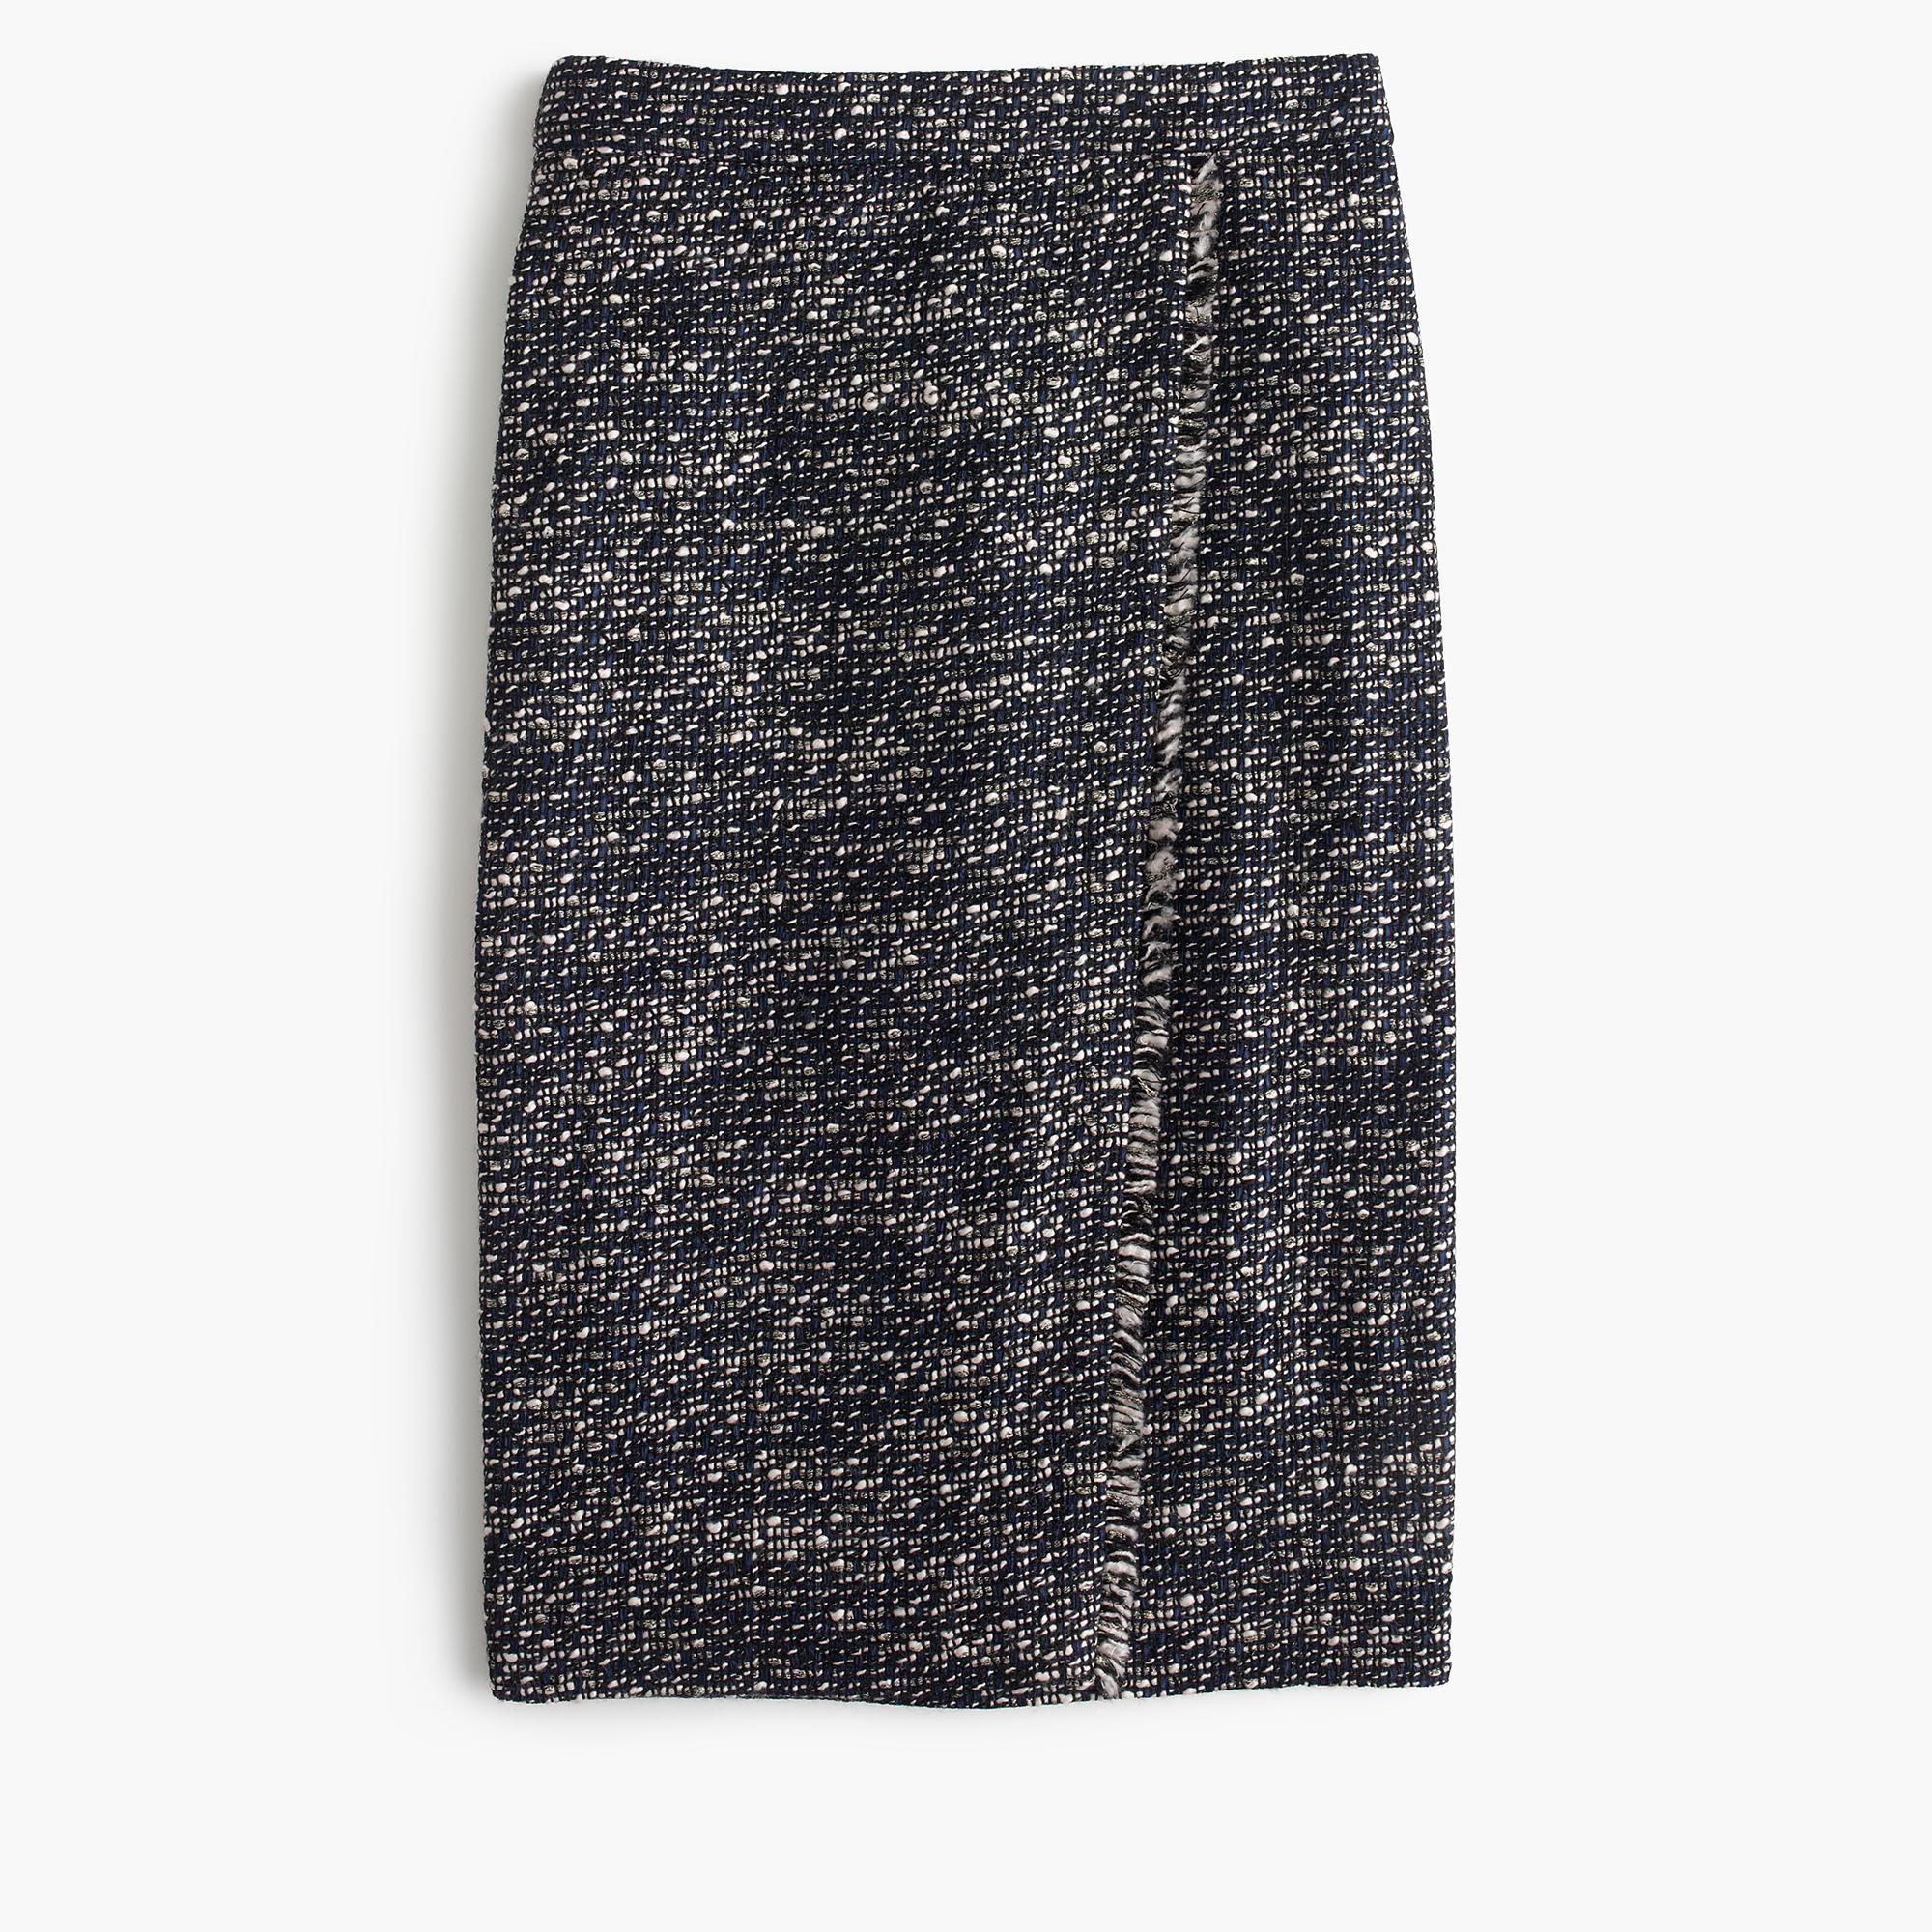 Faux-Wrap Pencil Skirt In Metallic Tweed : Women's Skirts | J.Crew